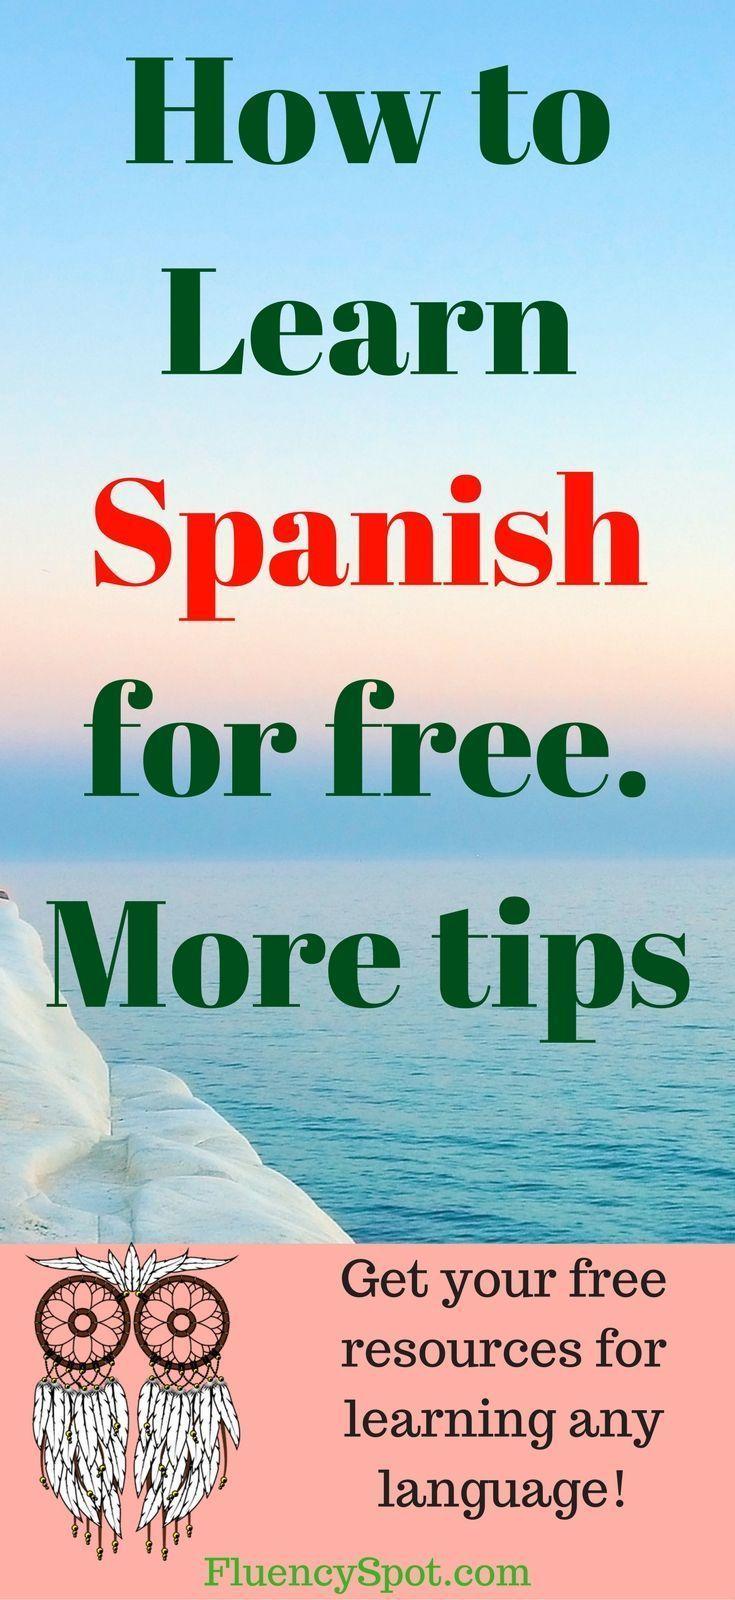 Learn Latin Online | Learnalanguage.com